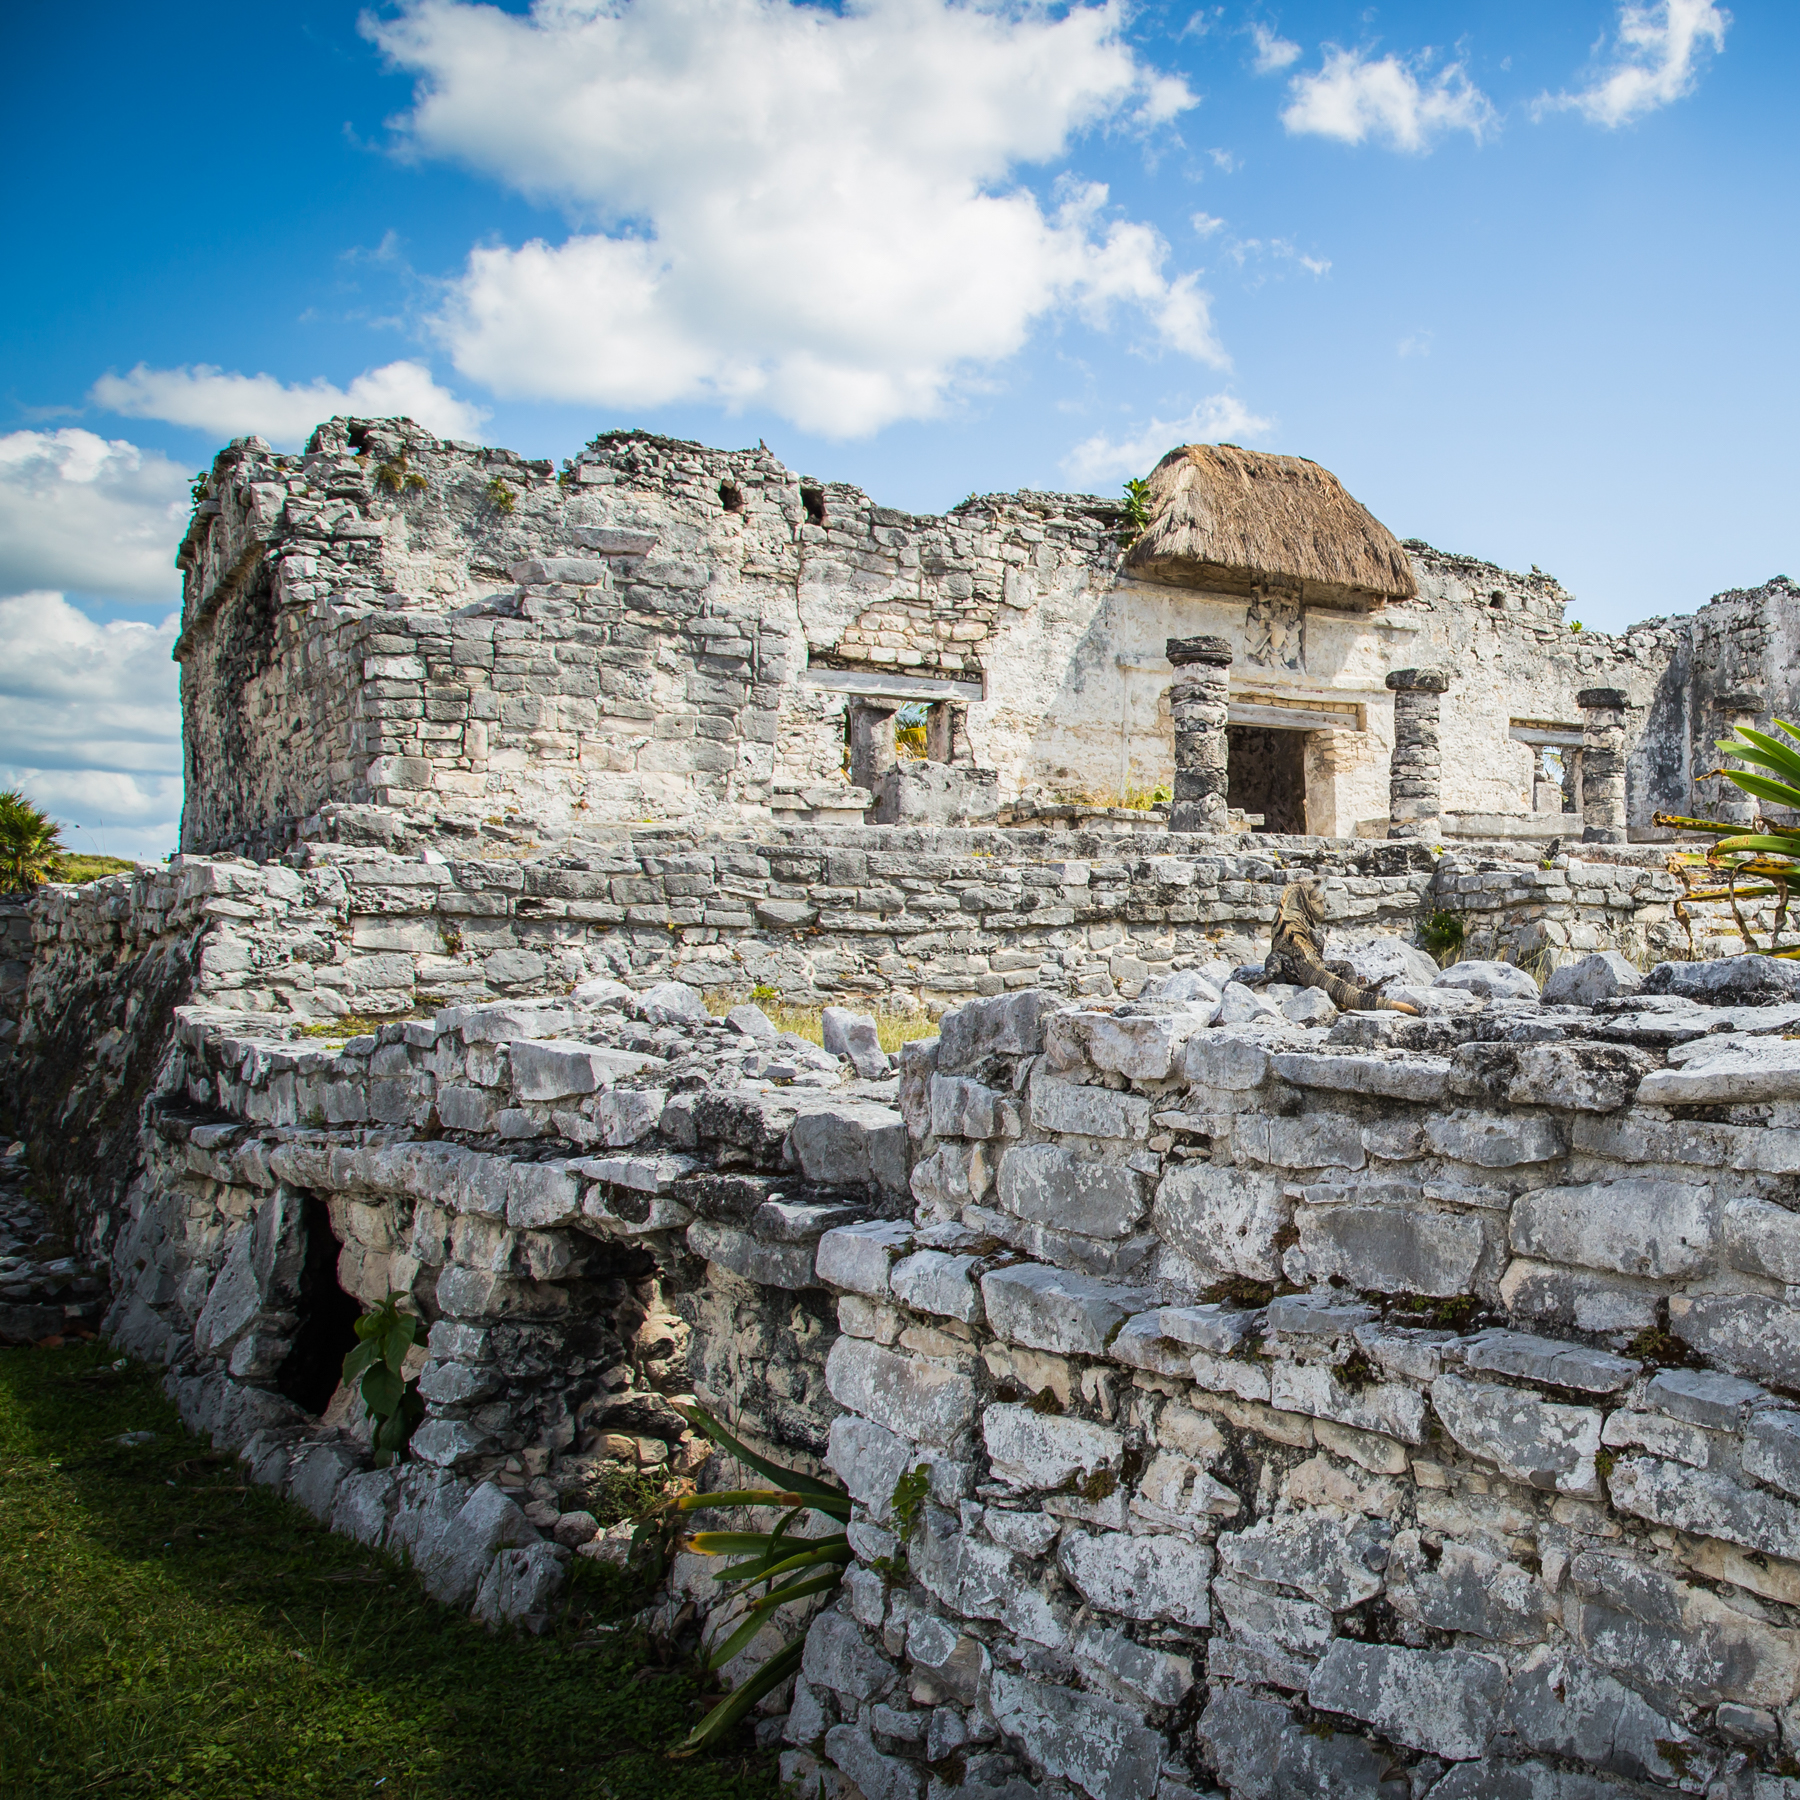 Ruins of Tulum, Mexico overlooking the Caribbean Sea. Mayan Temple, Tulum, Riviera Maya, Yucatan, Mexico